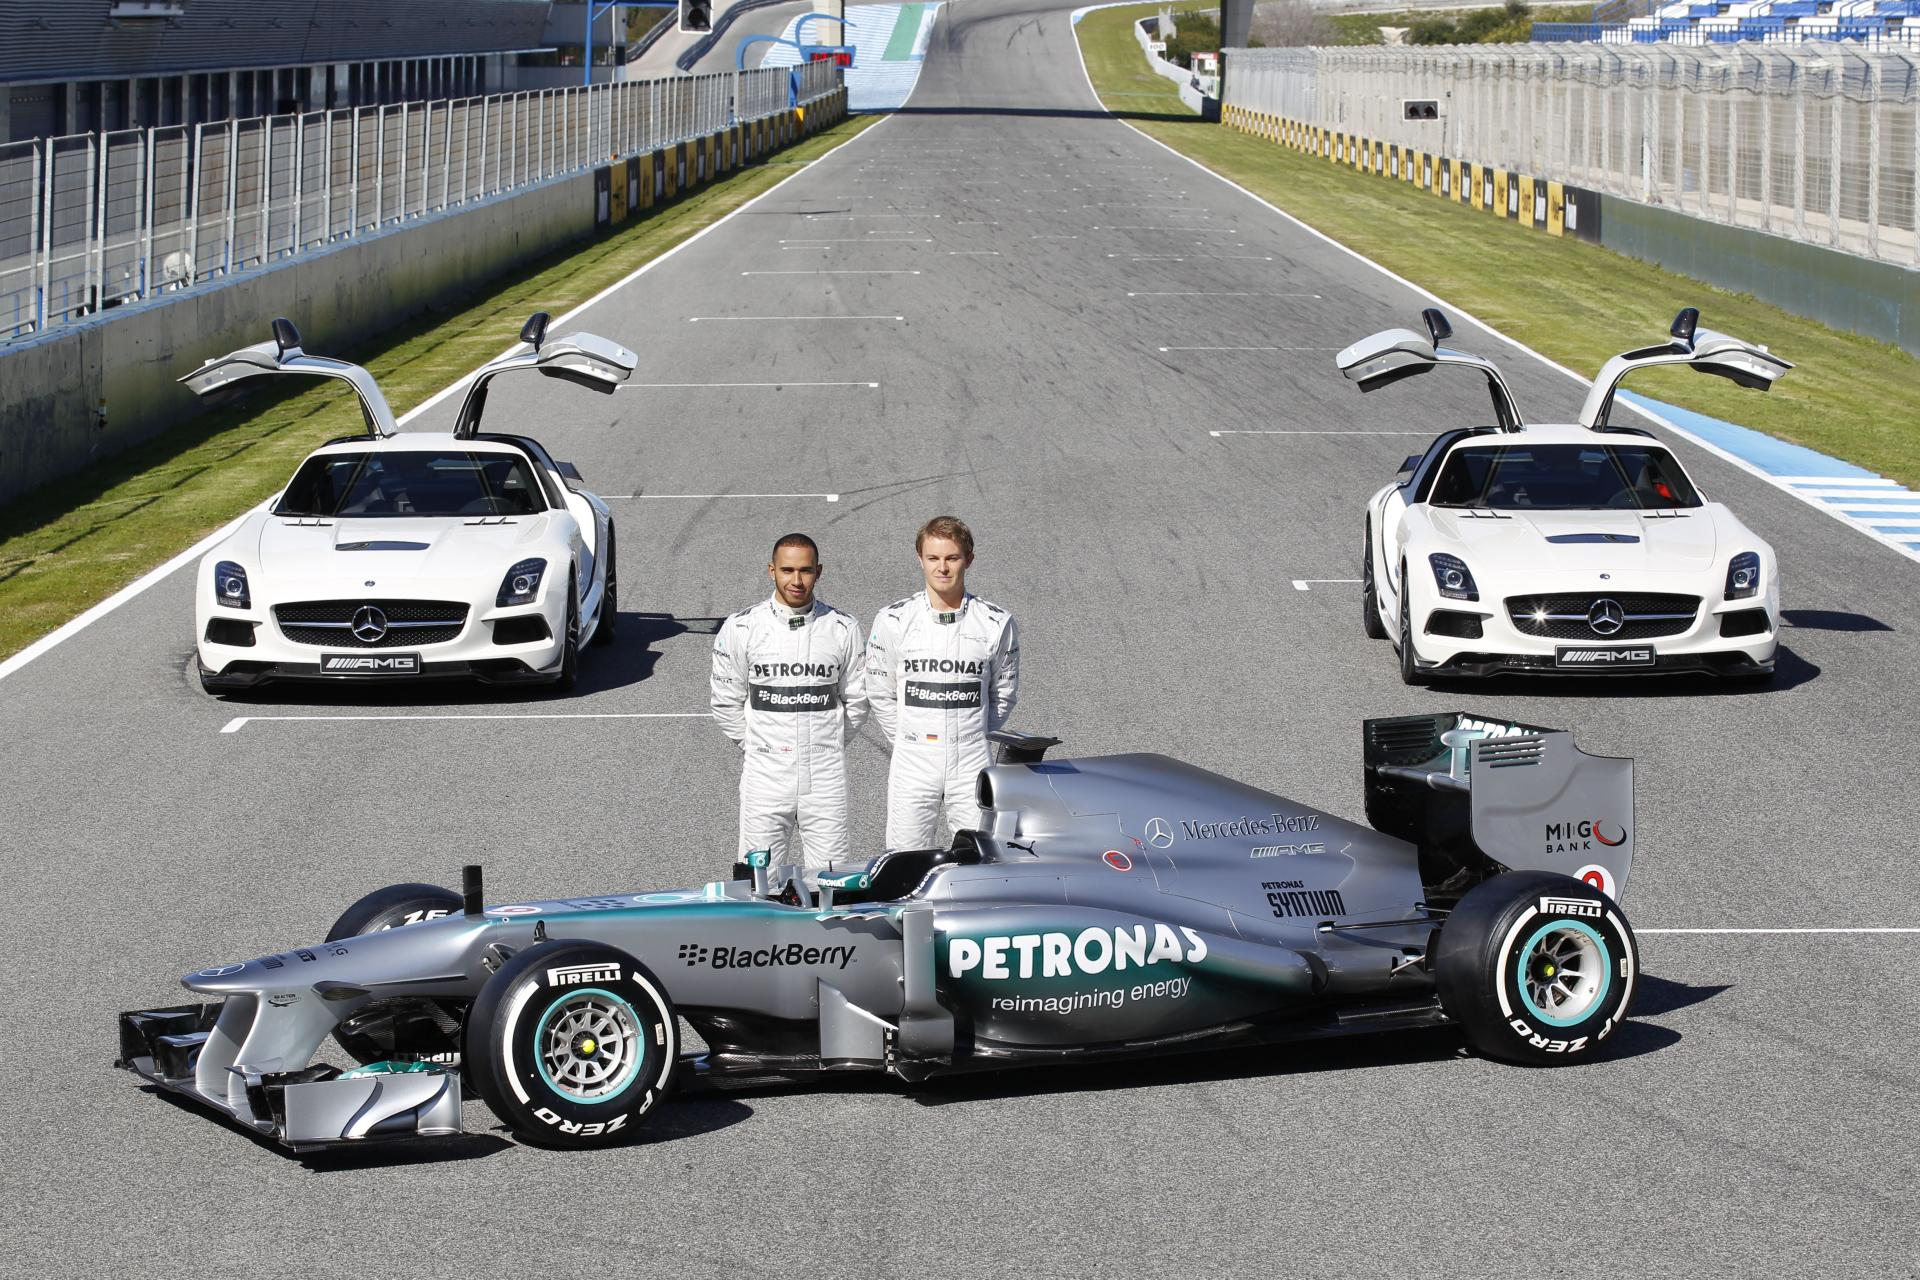 2013 mercedes benz w04 for Mercedes benz petronas